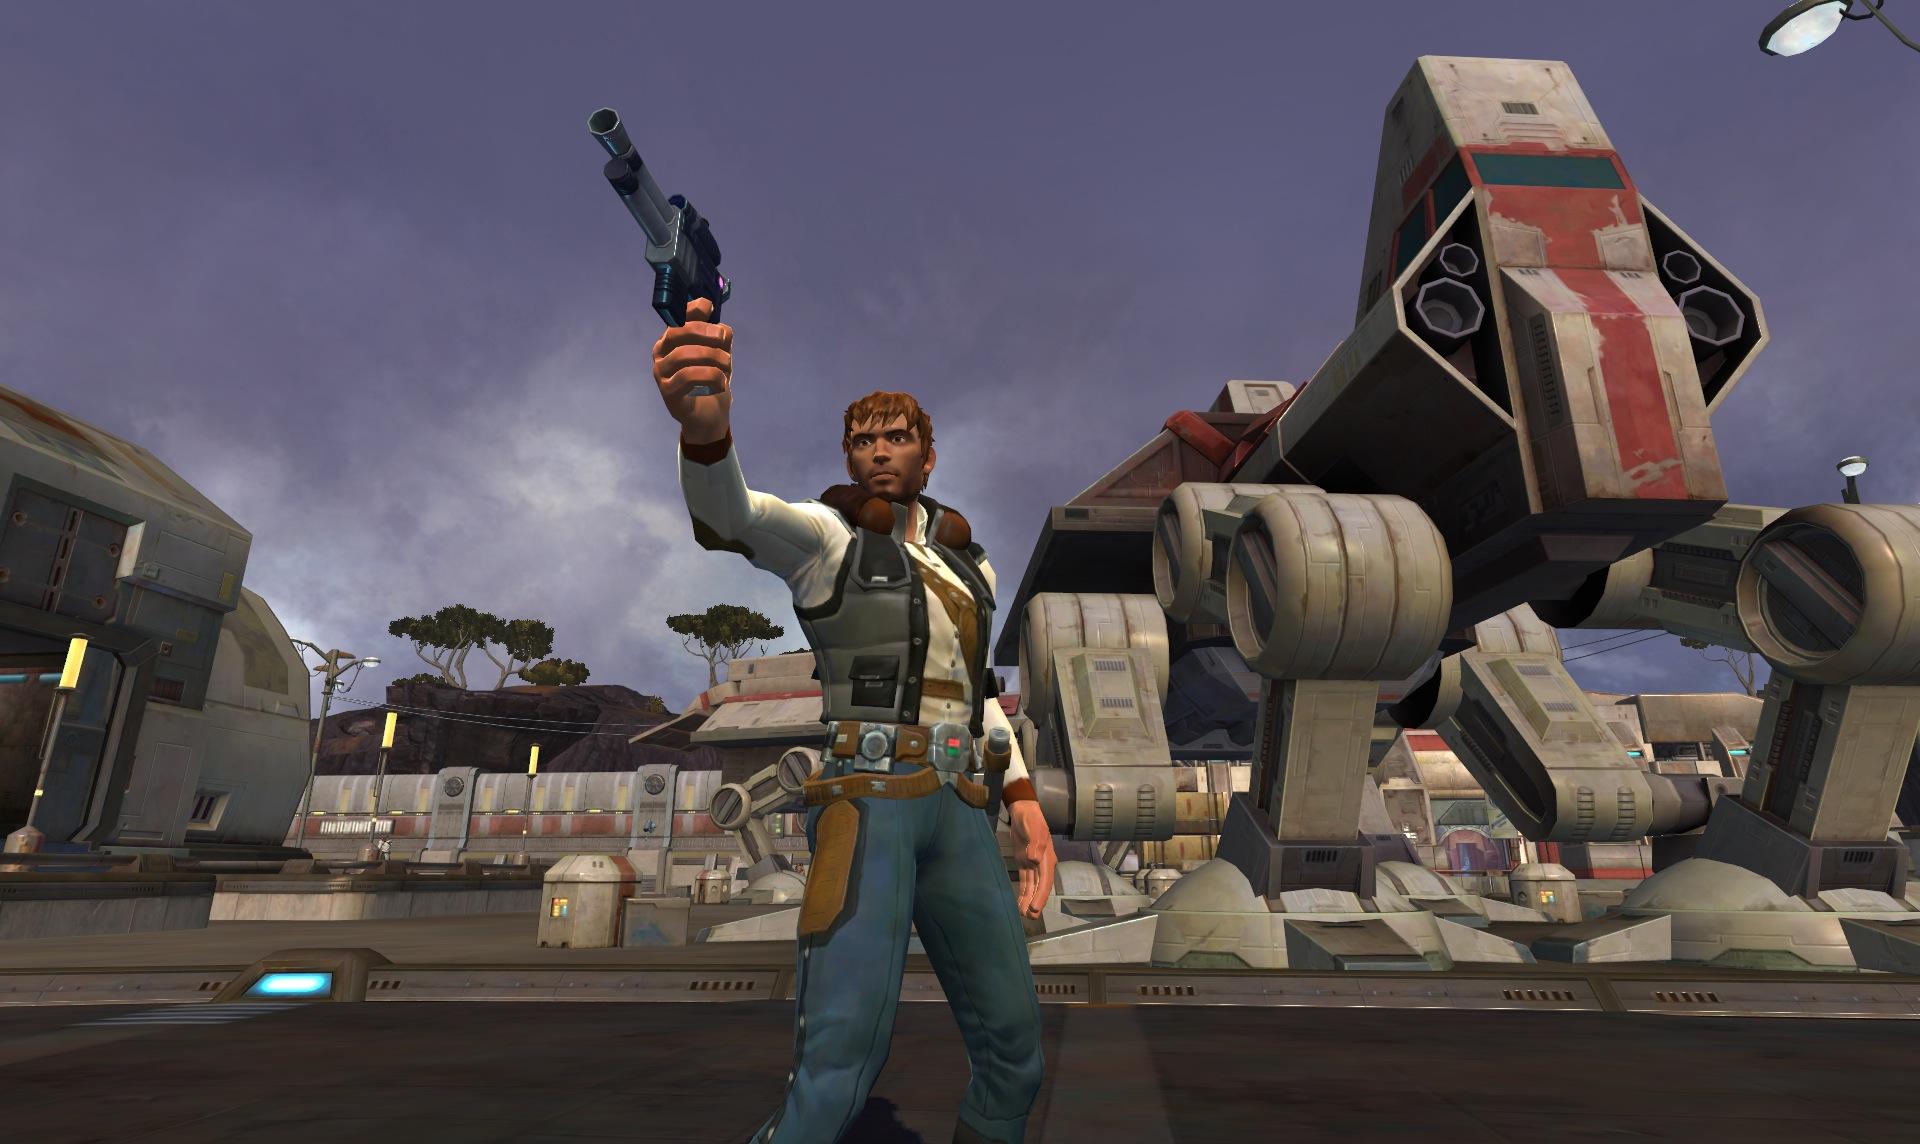 Image - Smuggler swtor.jpeg | Star Wars: The Old Republic Wiki ...